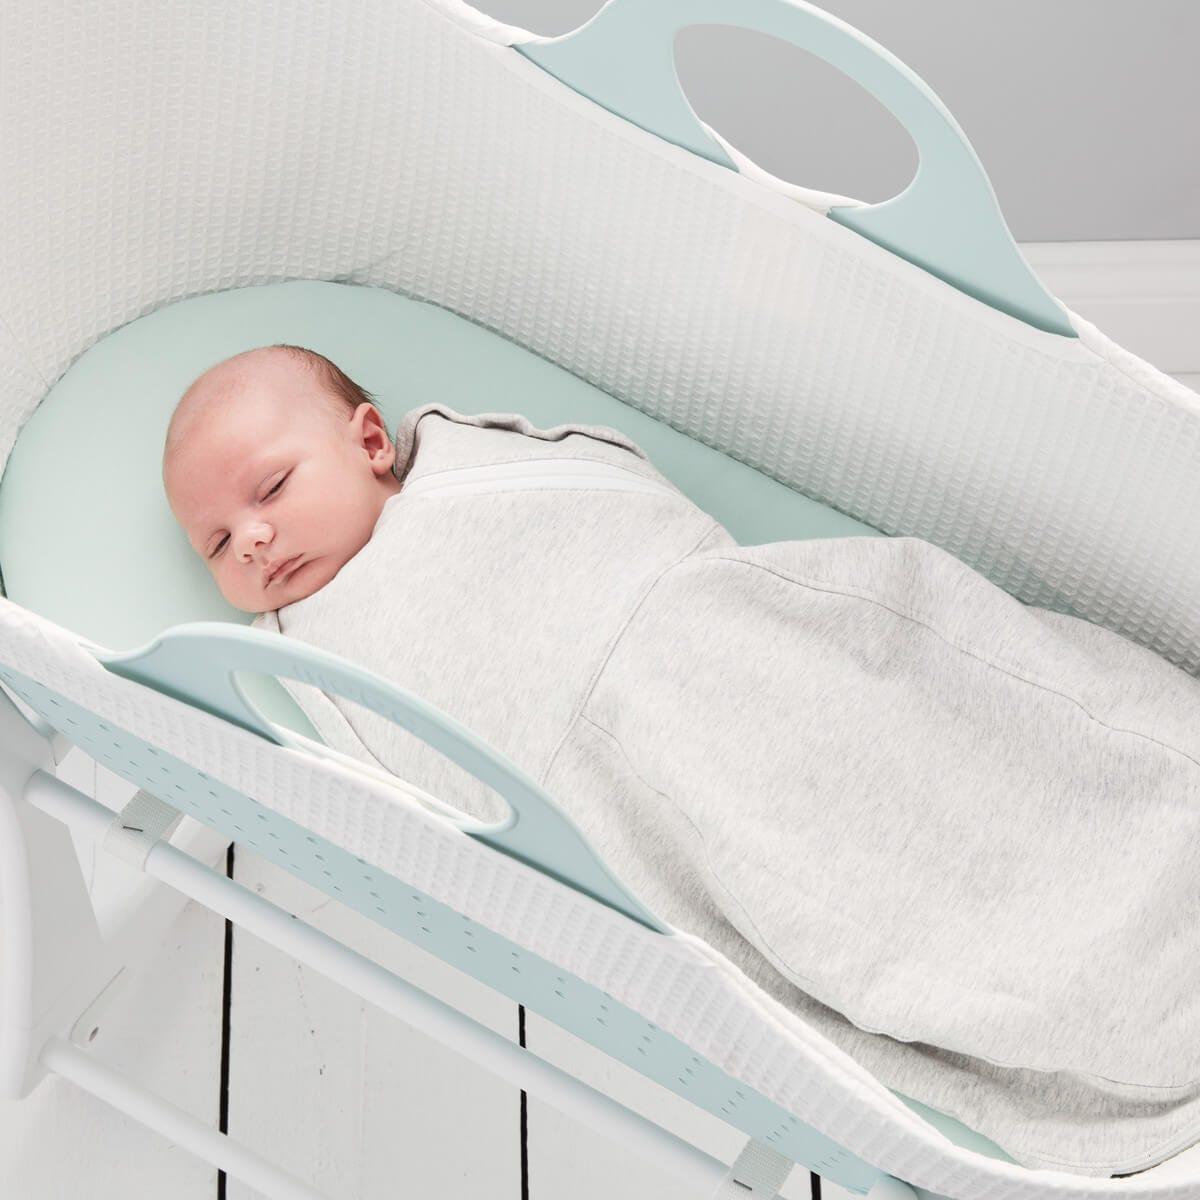 baby-in-sleepee-basket--wearing-grey-mark-grosnug